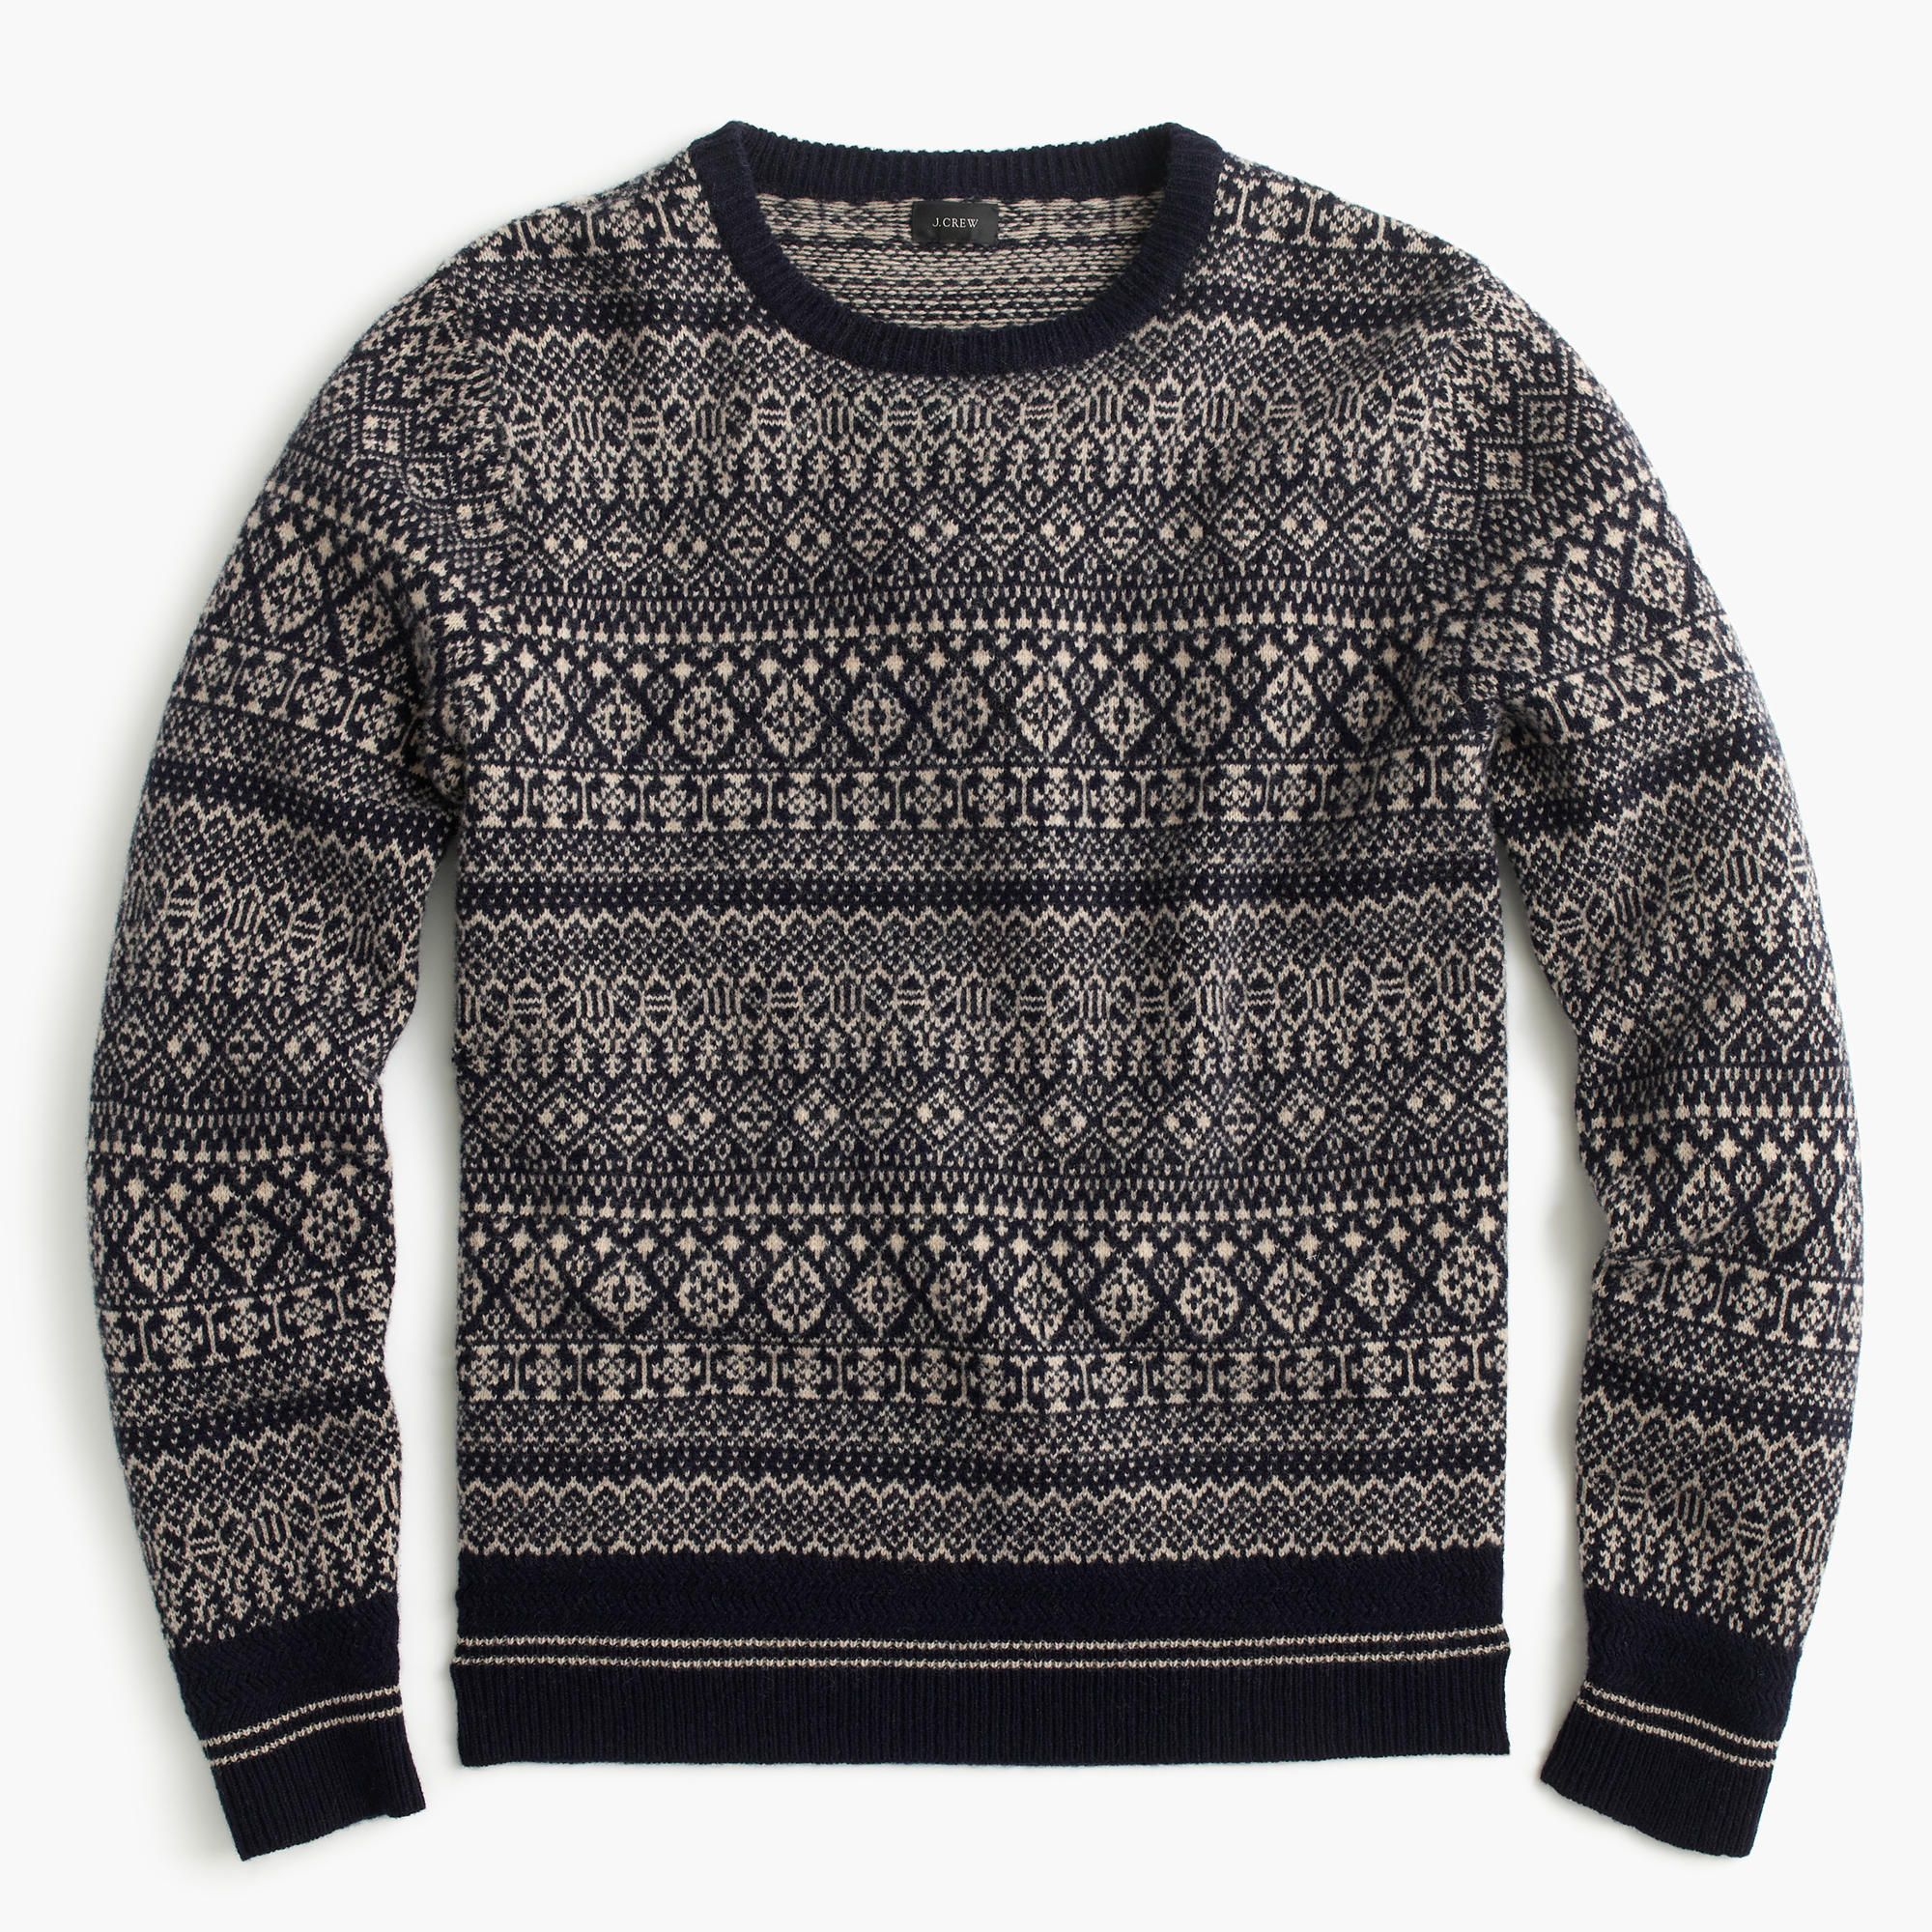 9c3bb02ad14a J.Crew - Lambswool mixed Fair Isle crewneck sweater | Men's Fashion ...